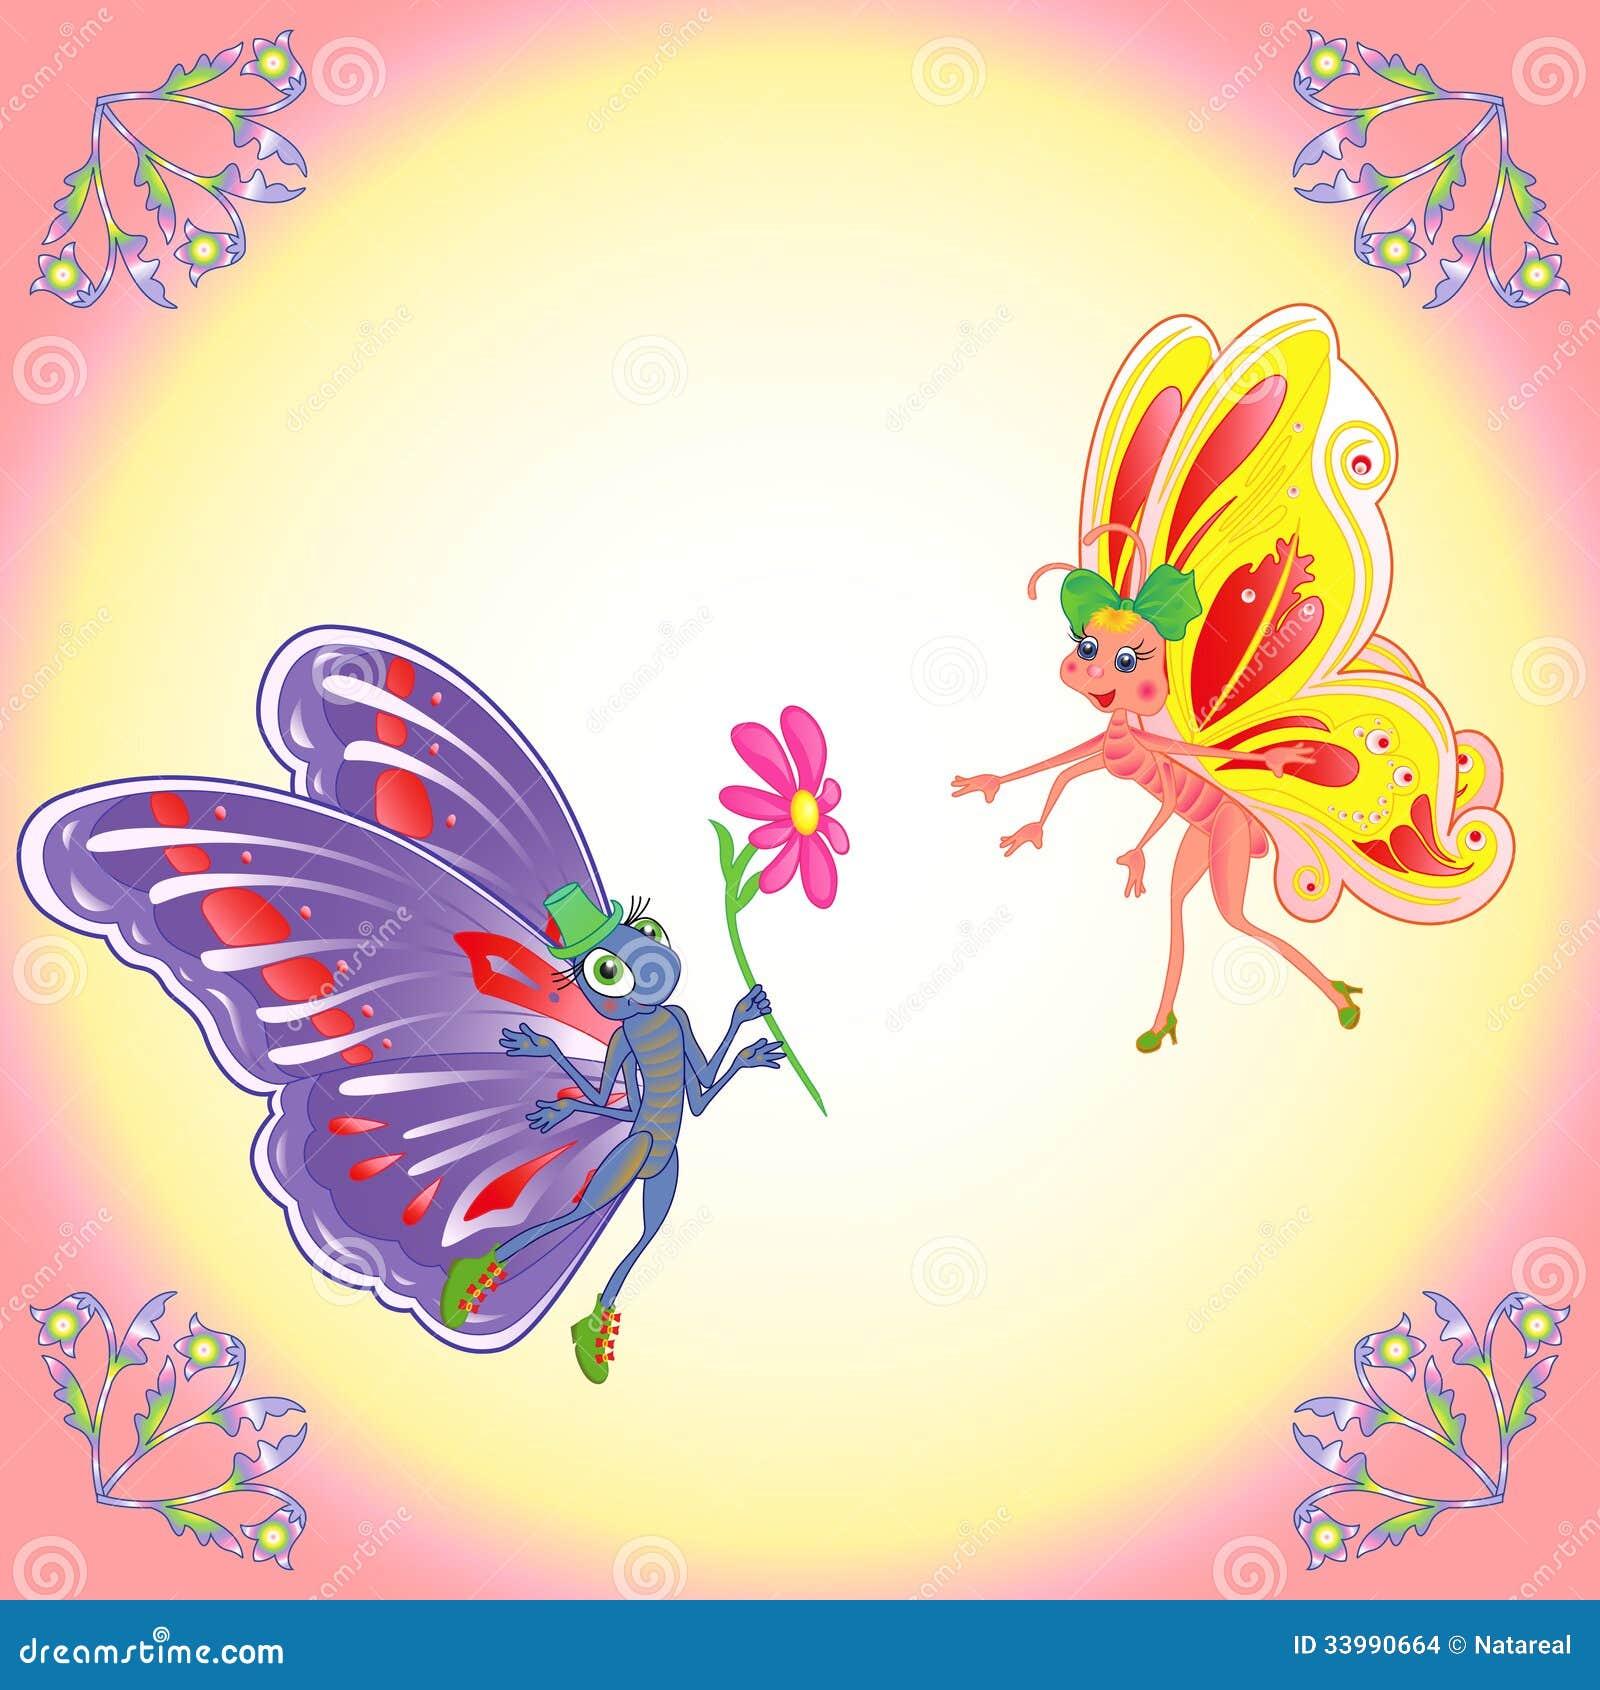 butterflies romantic pair stock images   image 33990664